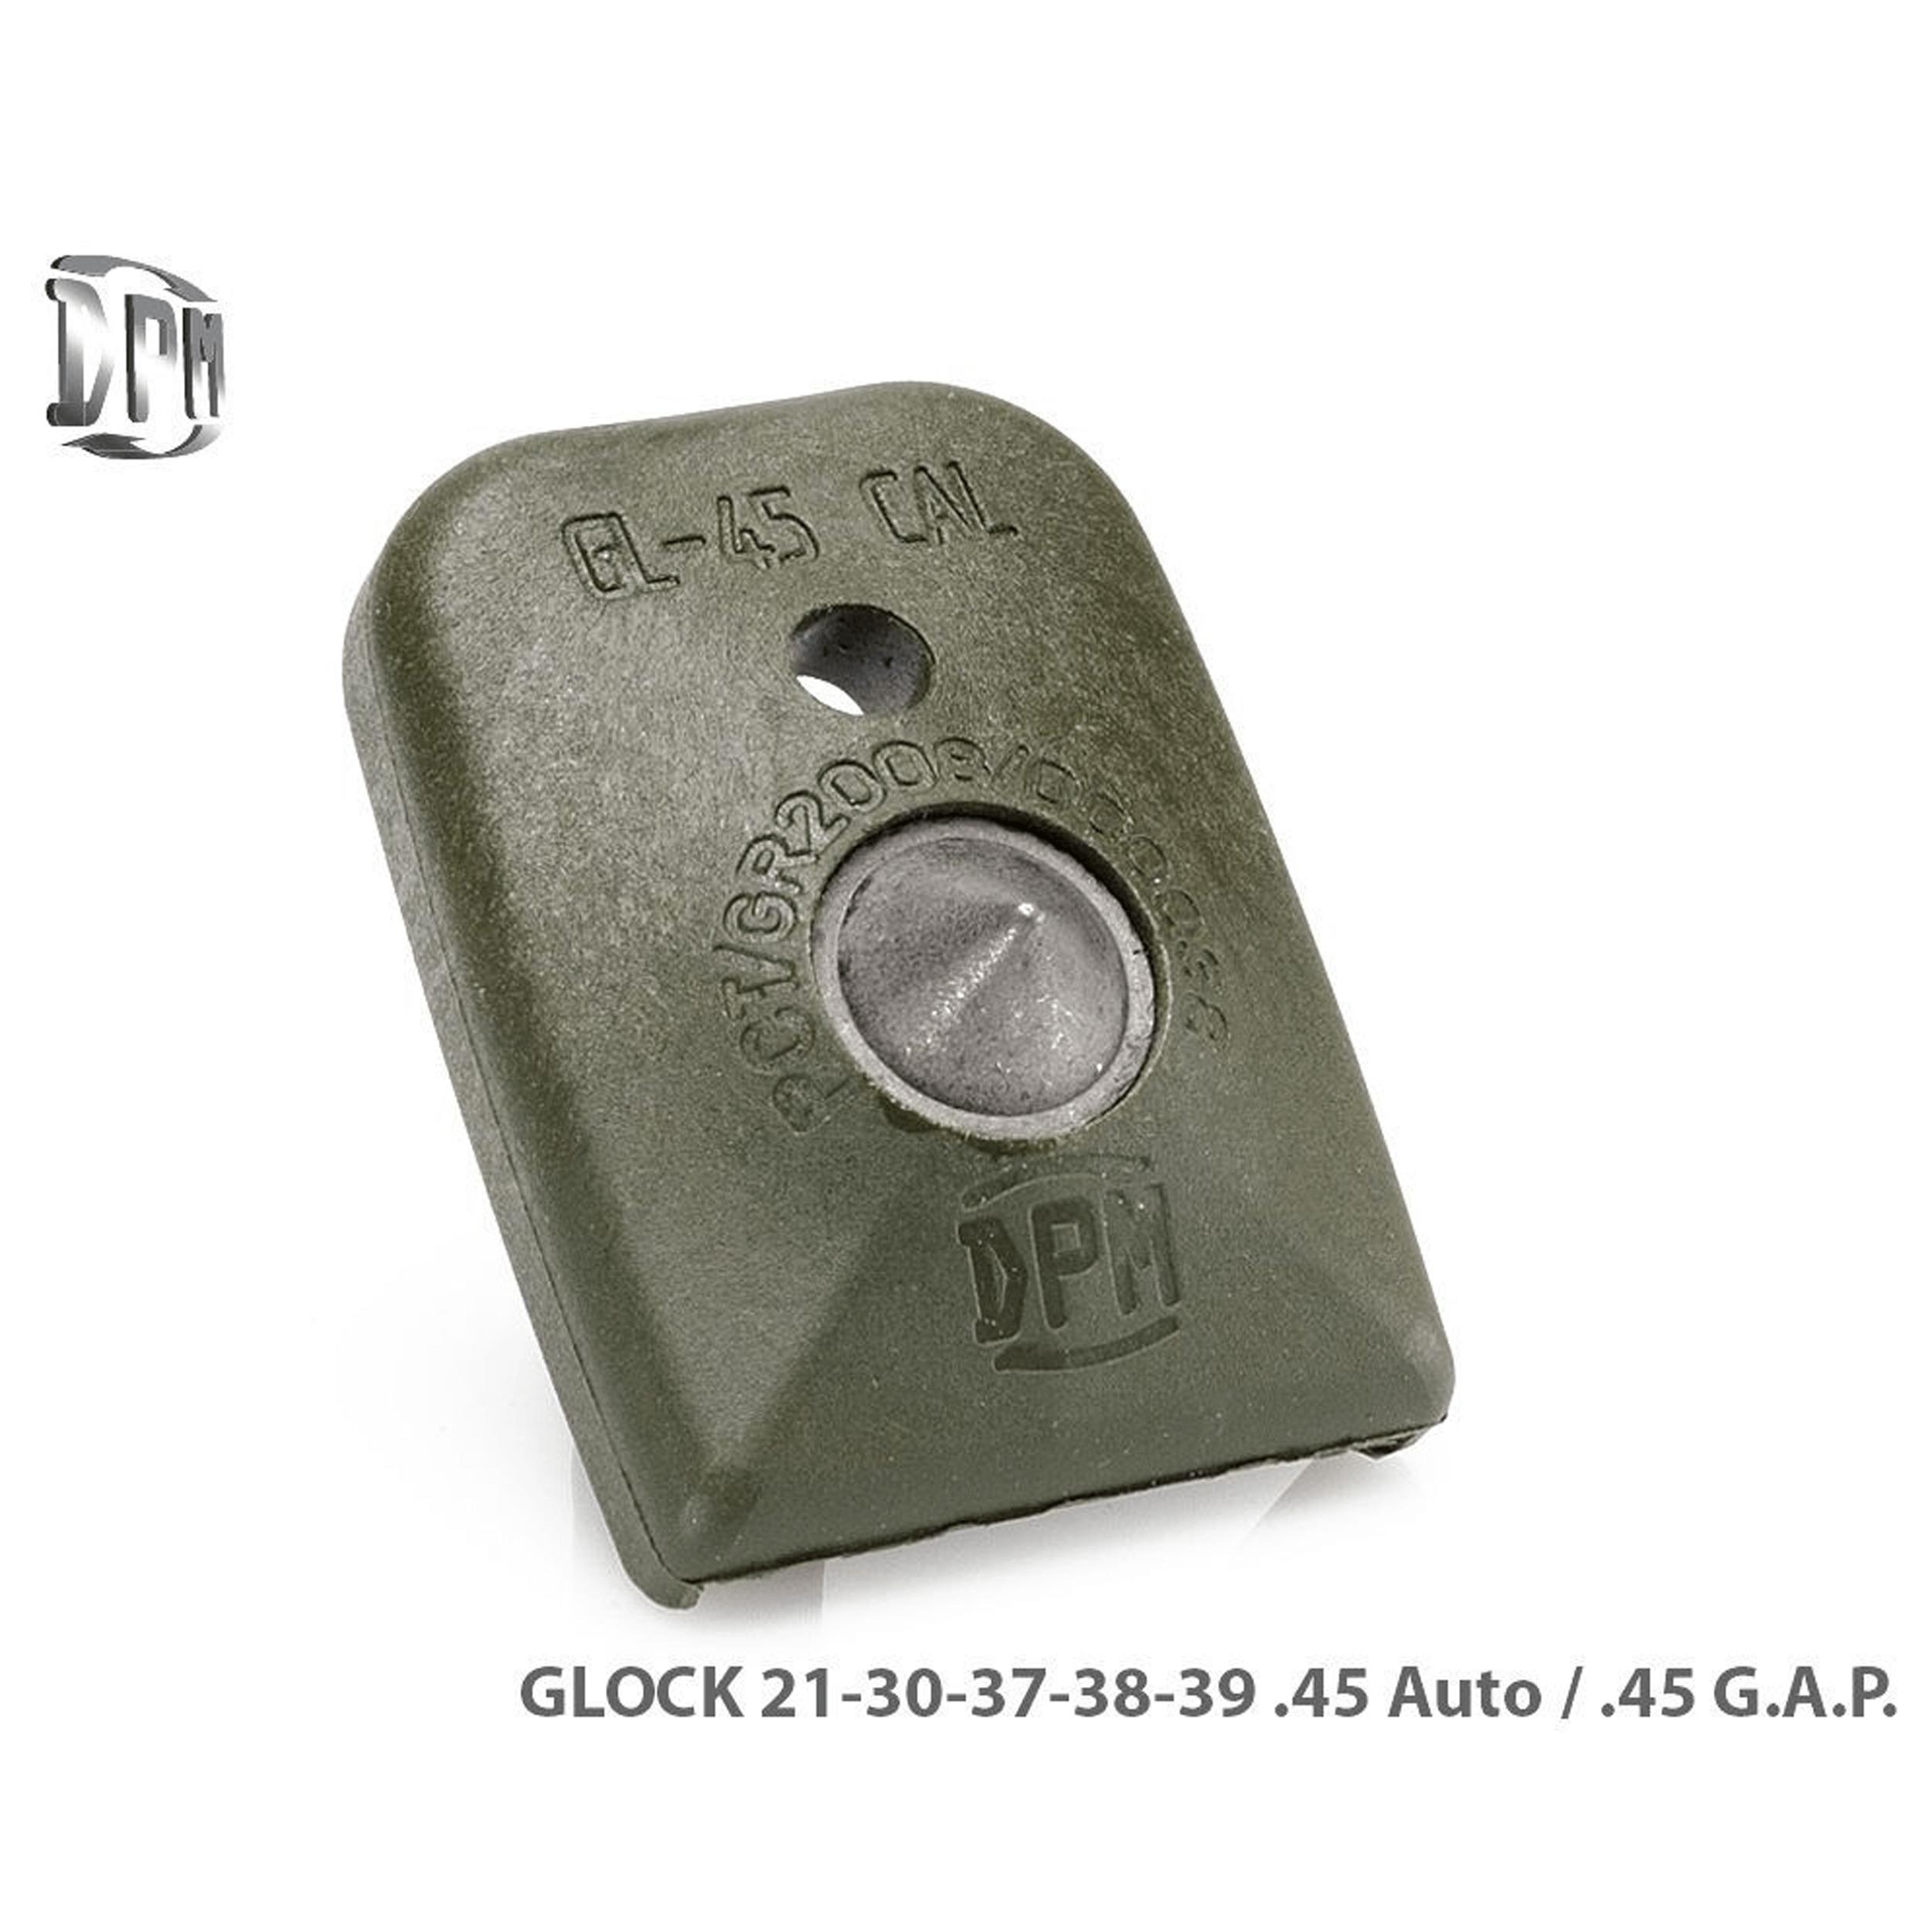 GLOCK 21 .45ACP  FLOORPLATE - GLASS BREAKER